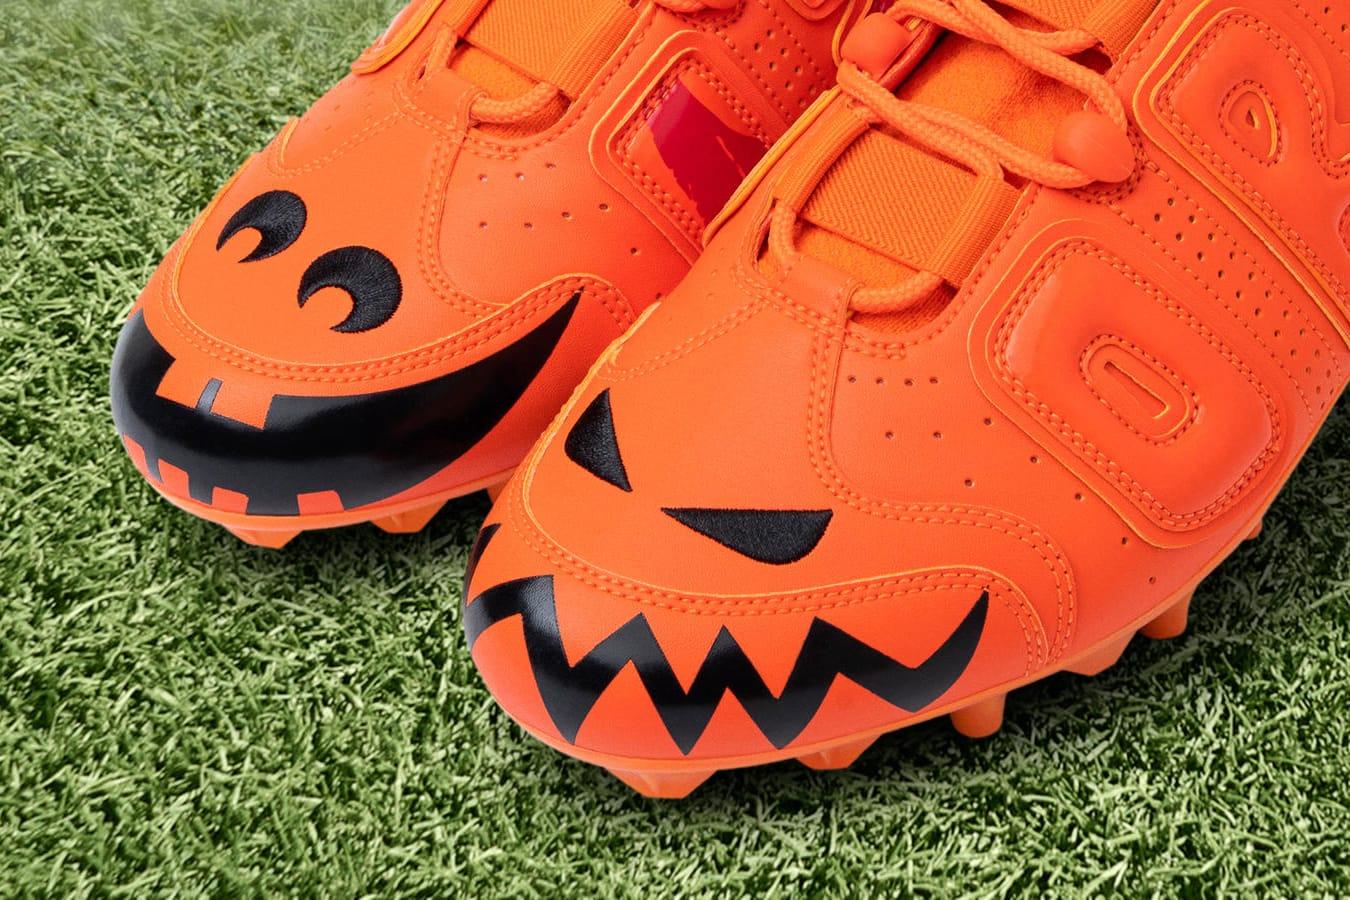 Odell Beckham Jr.'s Latest Nike Cleats